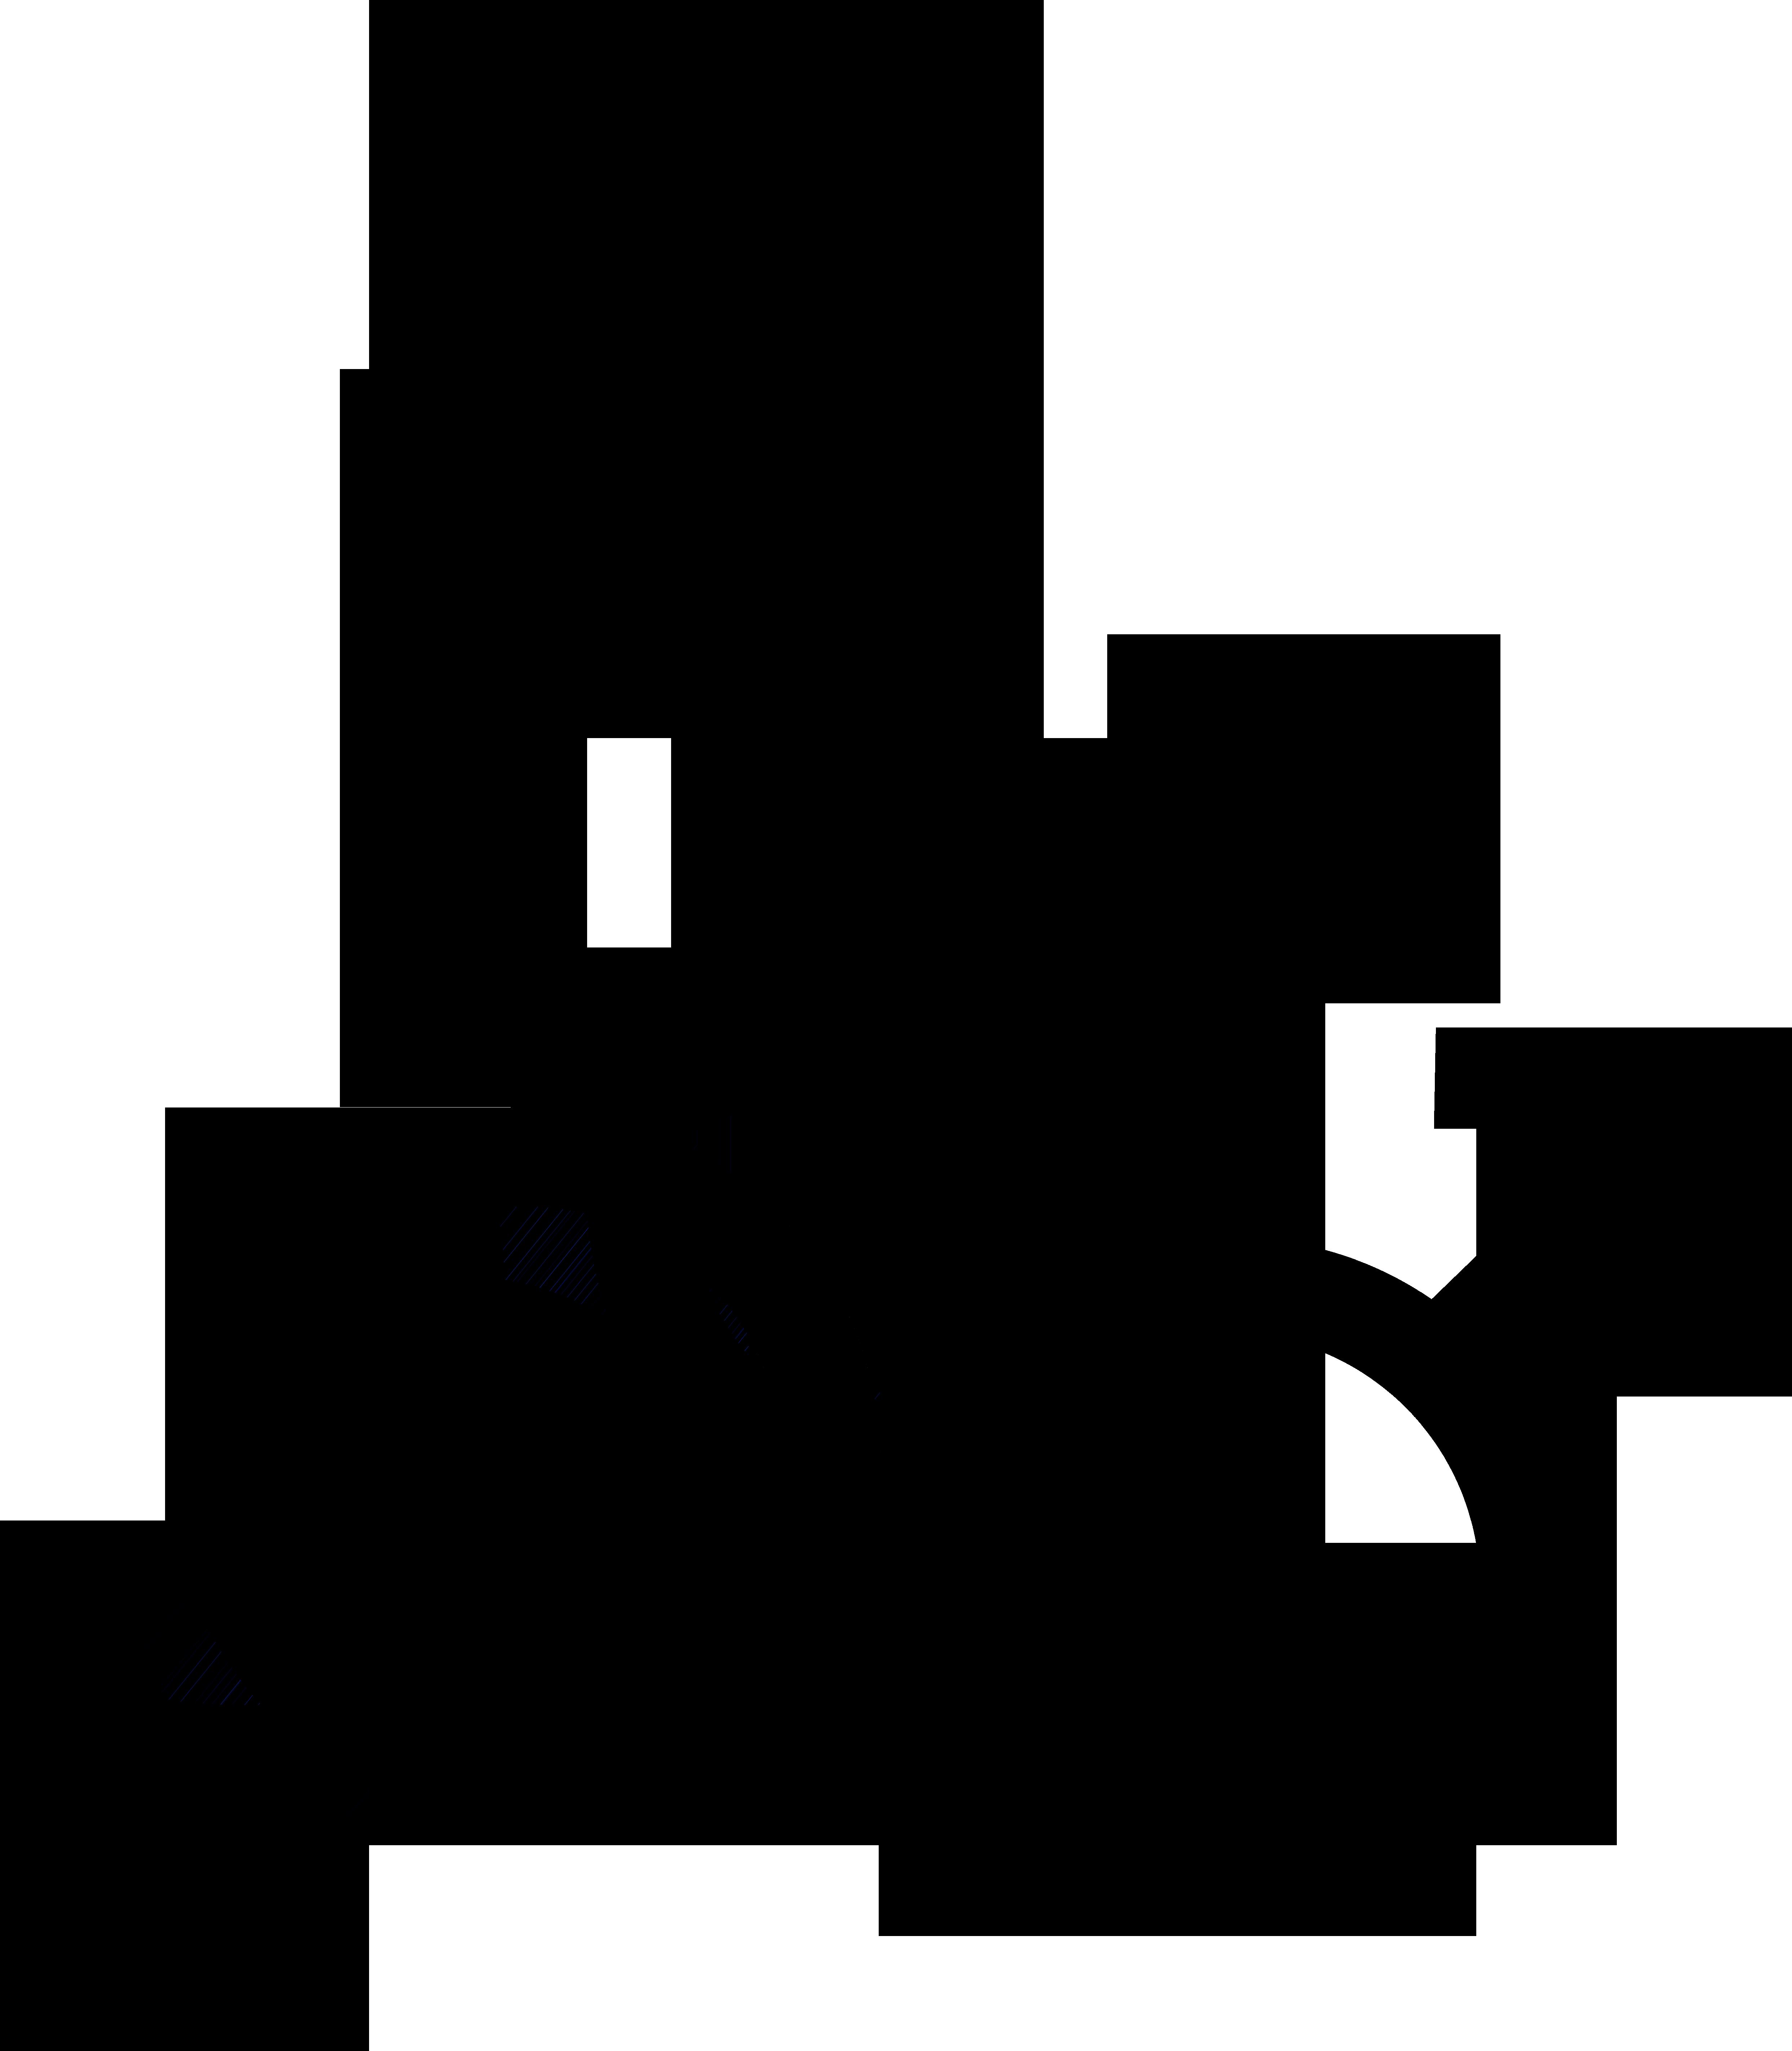 Nonbinary man symbol interlocked with a nonbinary symbol, a Venus symbol, and a Mars symbol.